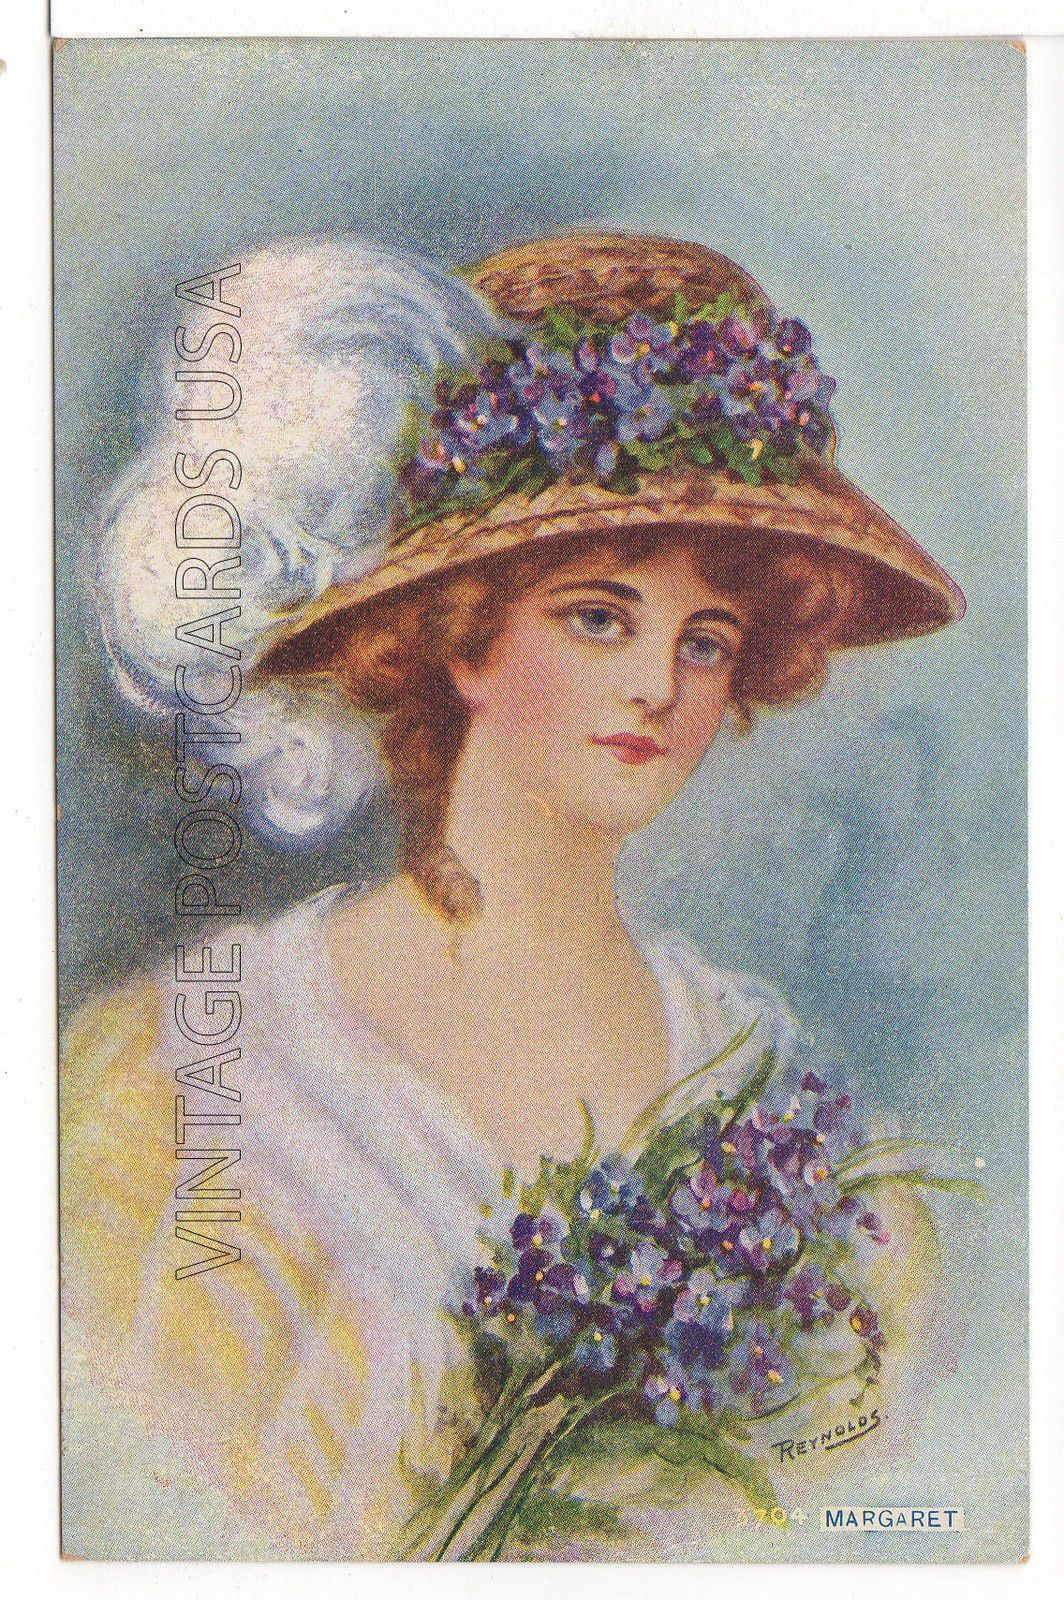 """Margaret"" BY Artist Reynolds Pretty Woman IN HAT Antique Postcard | eBay"